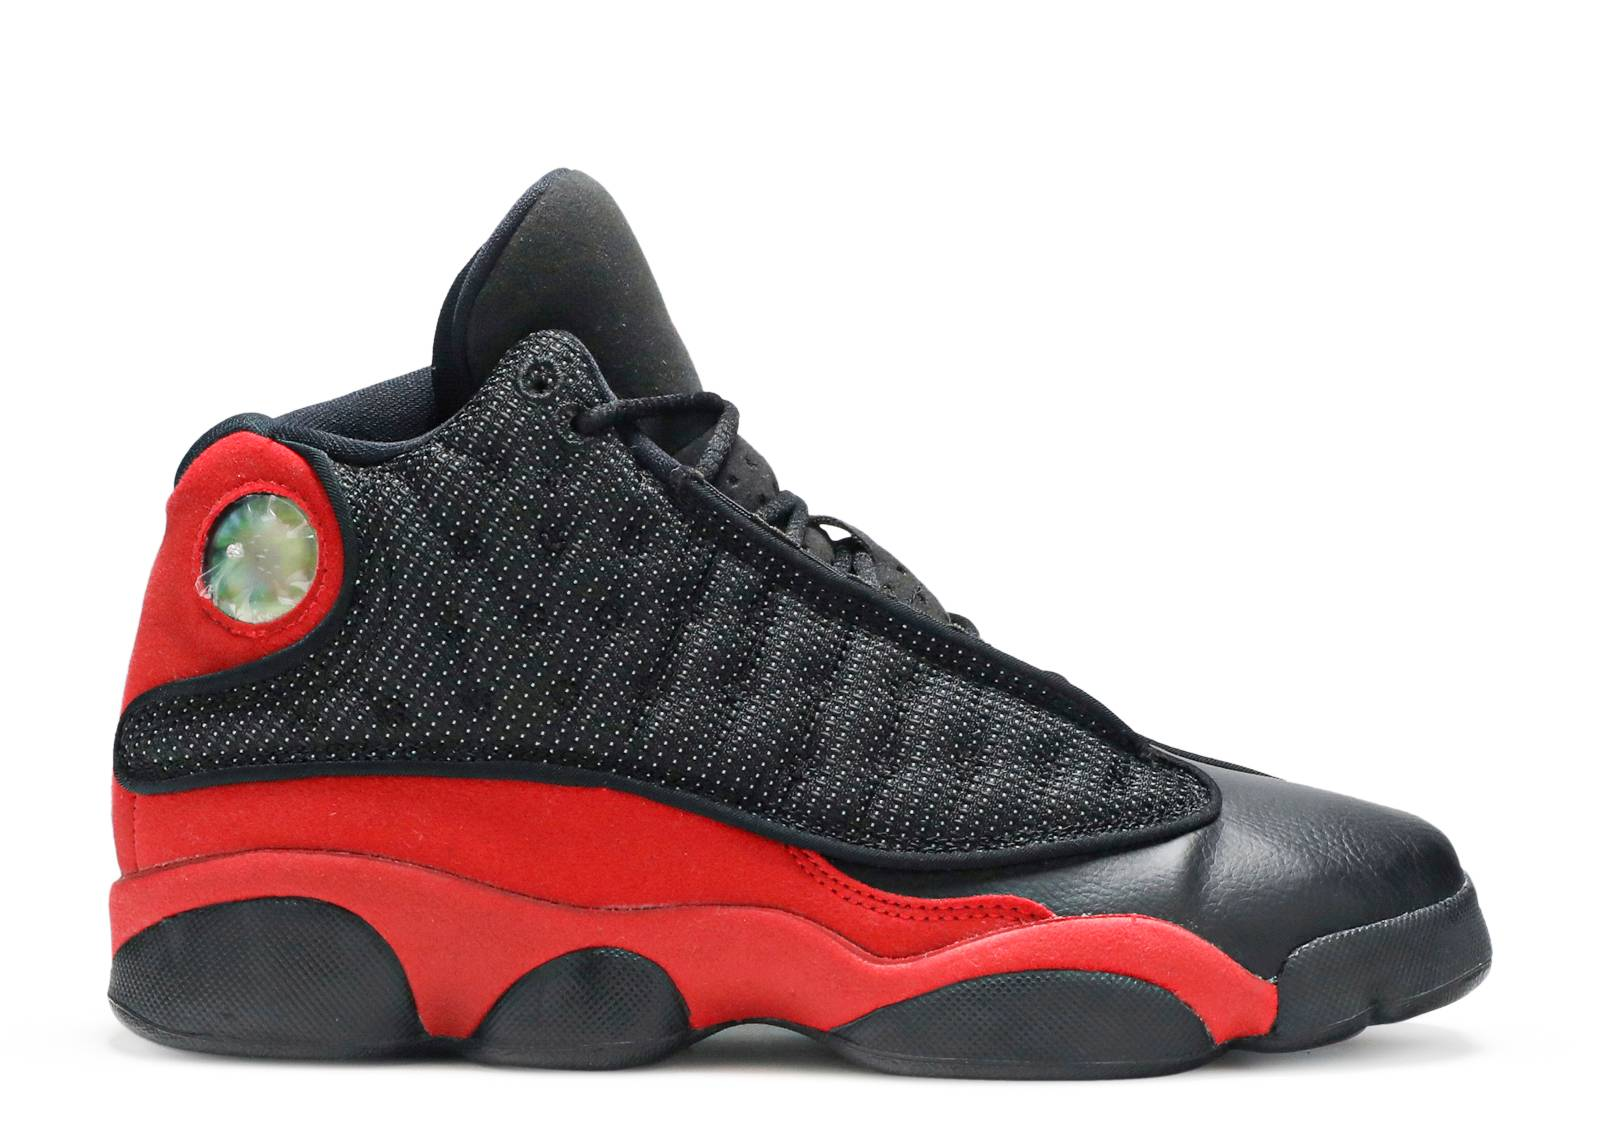 2dbf503e04fe Air Jordan 13 (XIII) Shoes - Nike